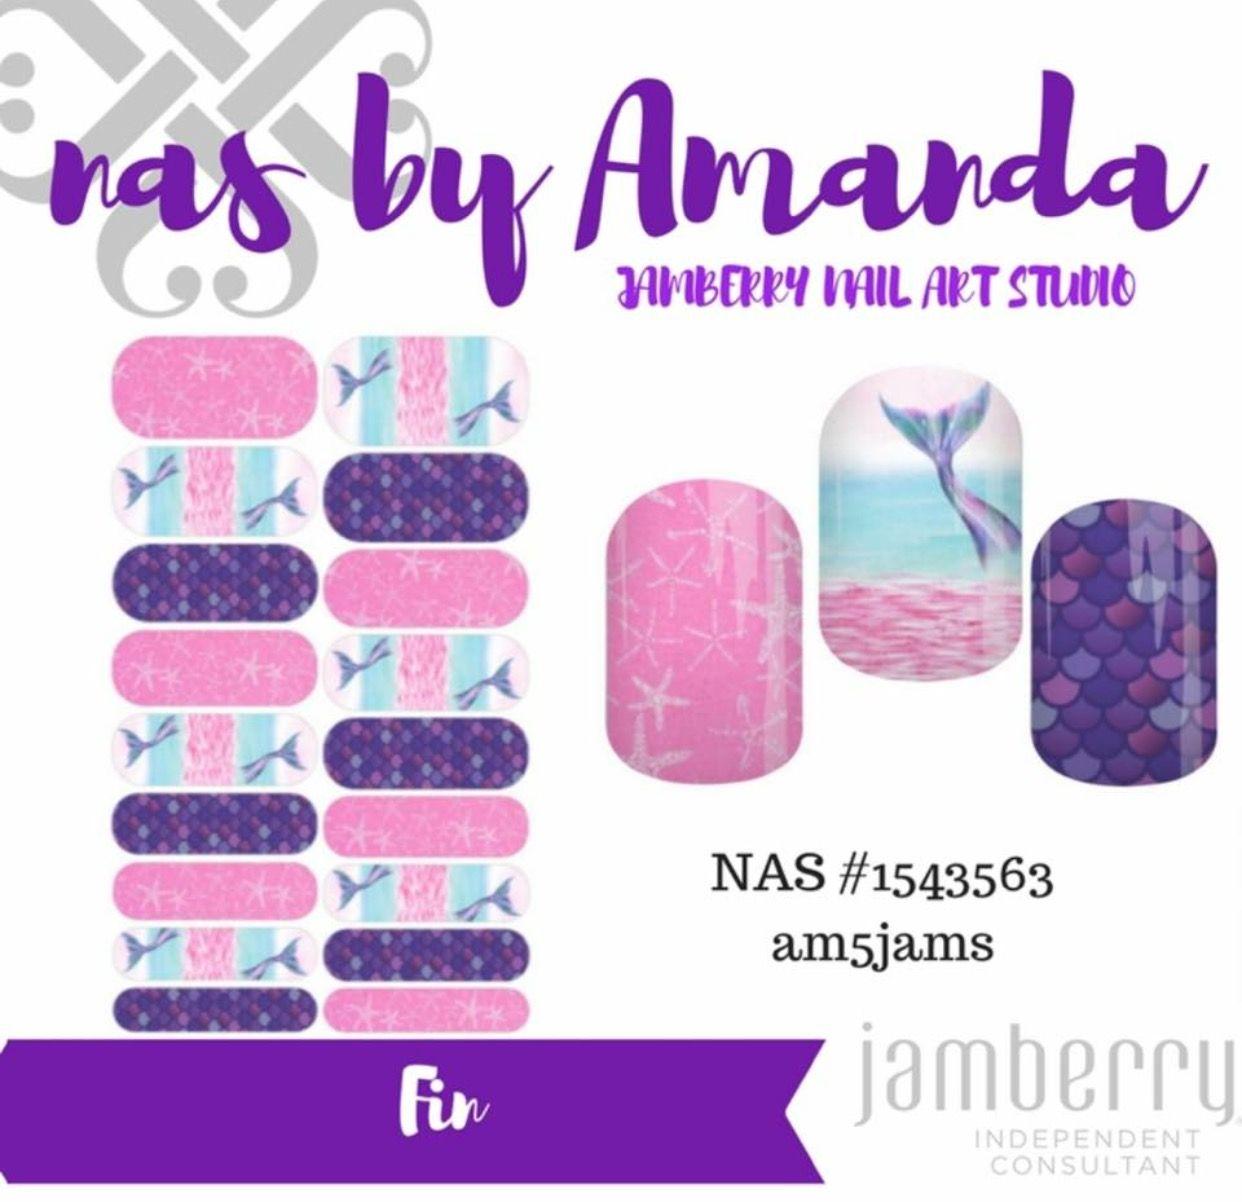 Jamberry Nail Art Studio Designs - Best Nail 2018